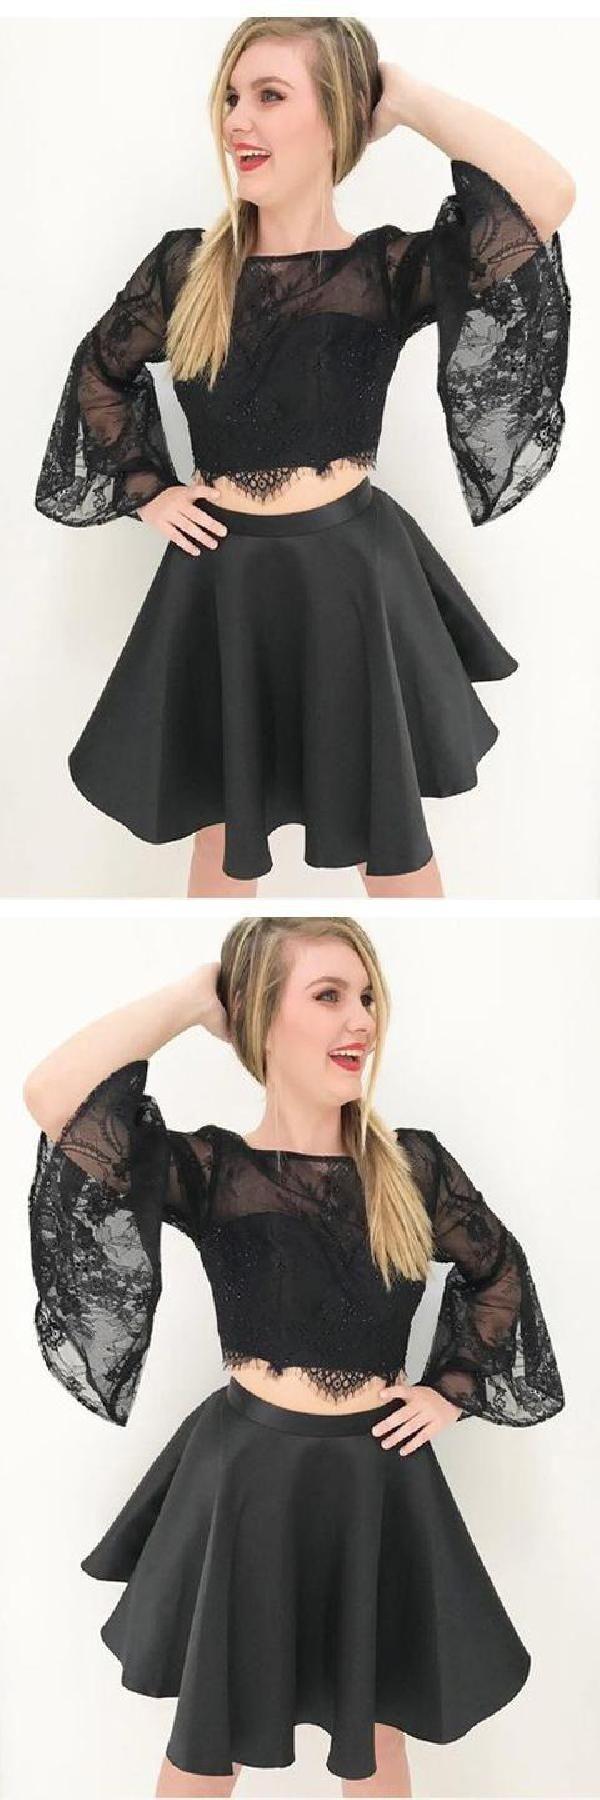 Discount feminine black lace prom dresses cute prom dresses prom